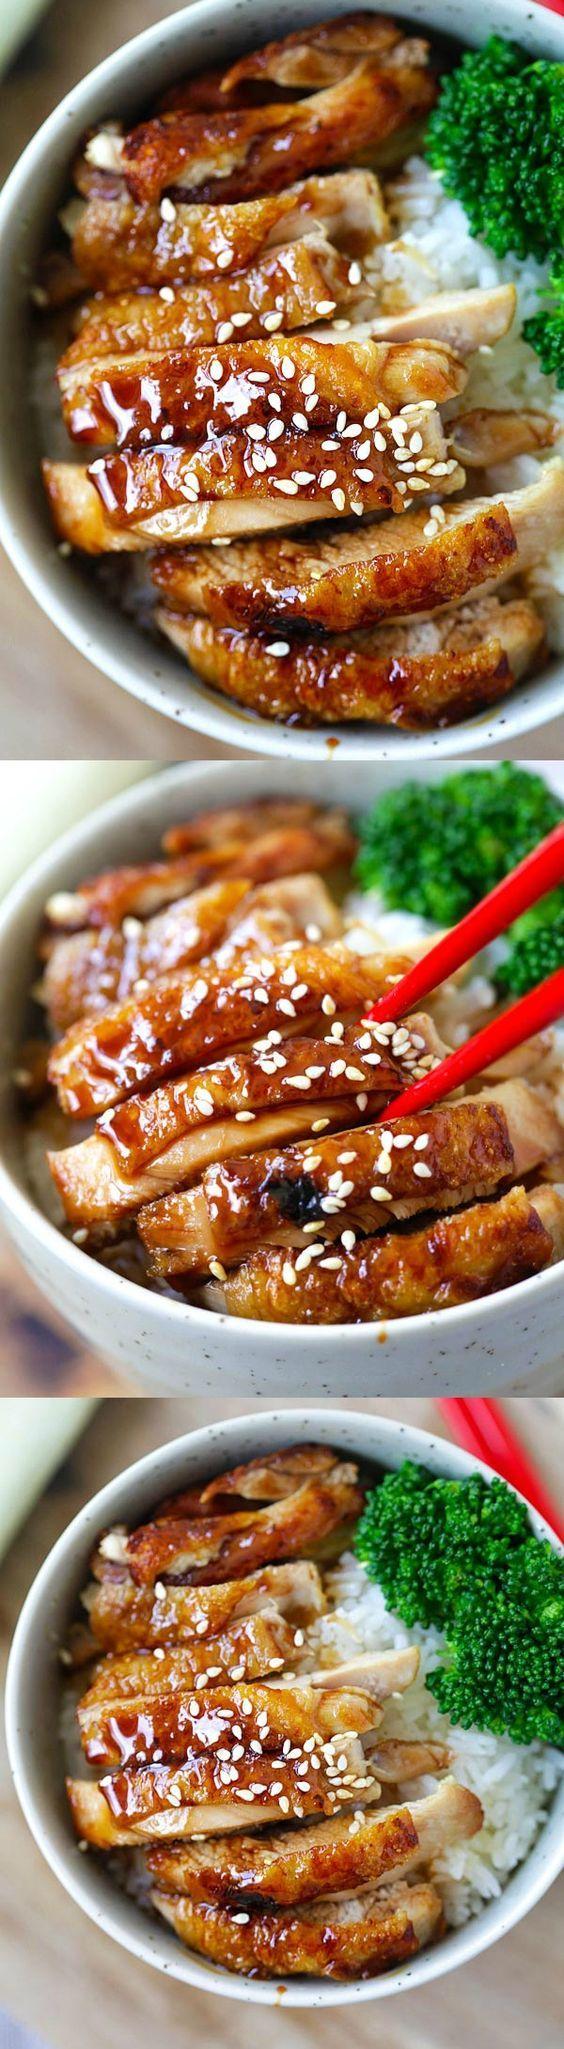 How to make chicken teriyaki – EASY recipe for teriyaki sauce plus chicken teriyaki that tastes like Japanese restaurants | rasamalaysia.com: